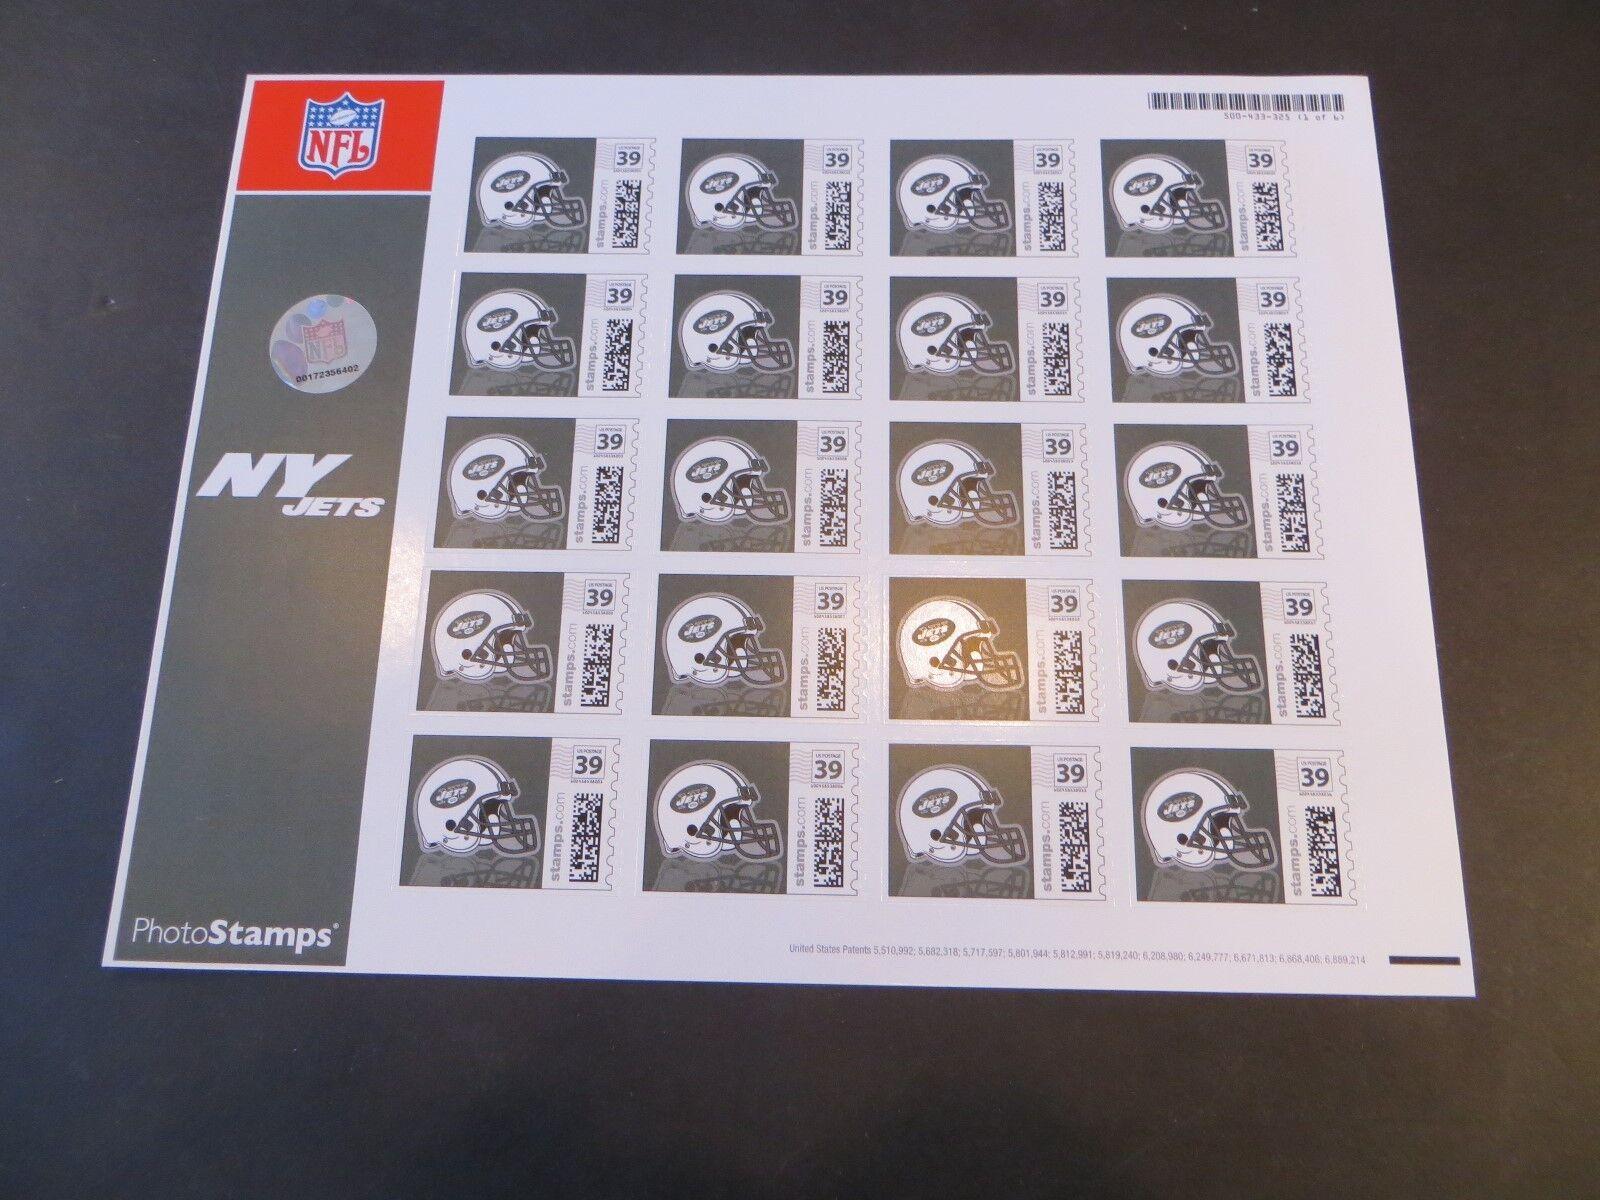 Raro 2006 New York Jets Nfl Fútbol-licened hoja de estampillas postales - 20  1 de 6